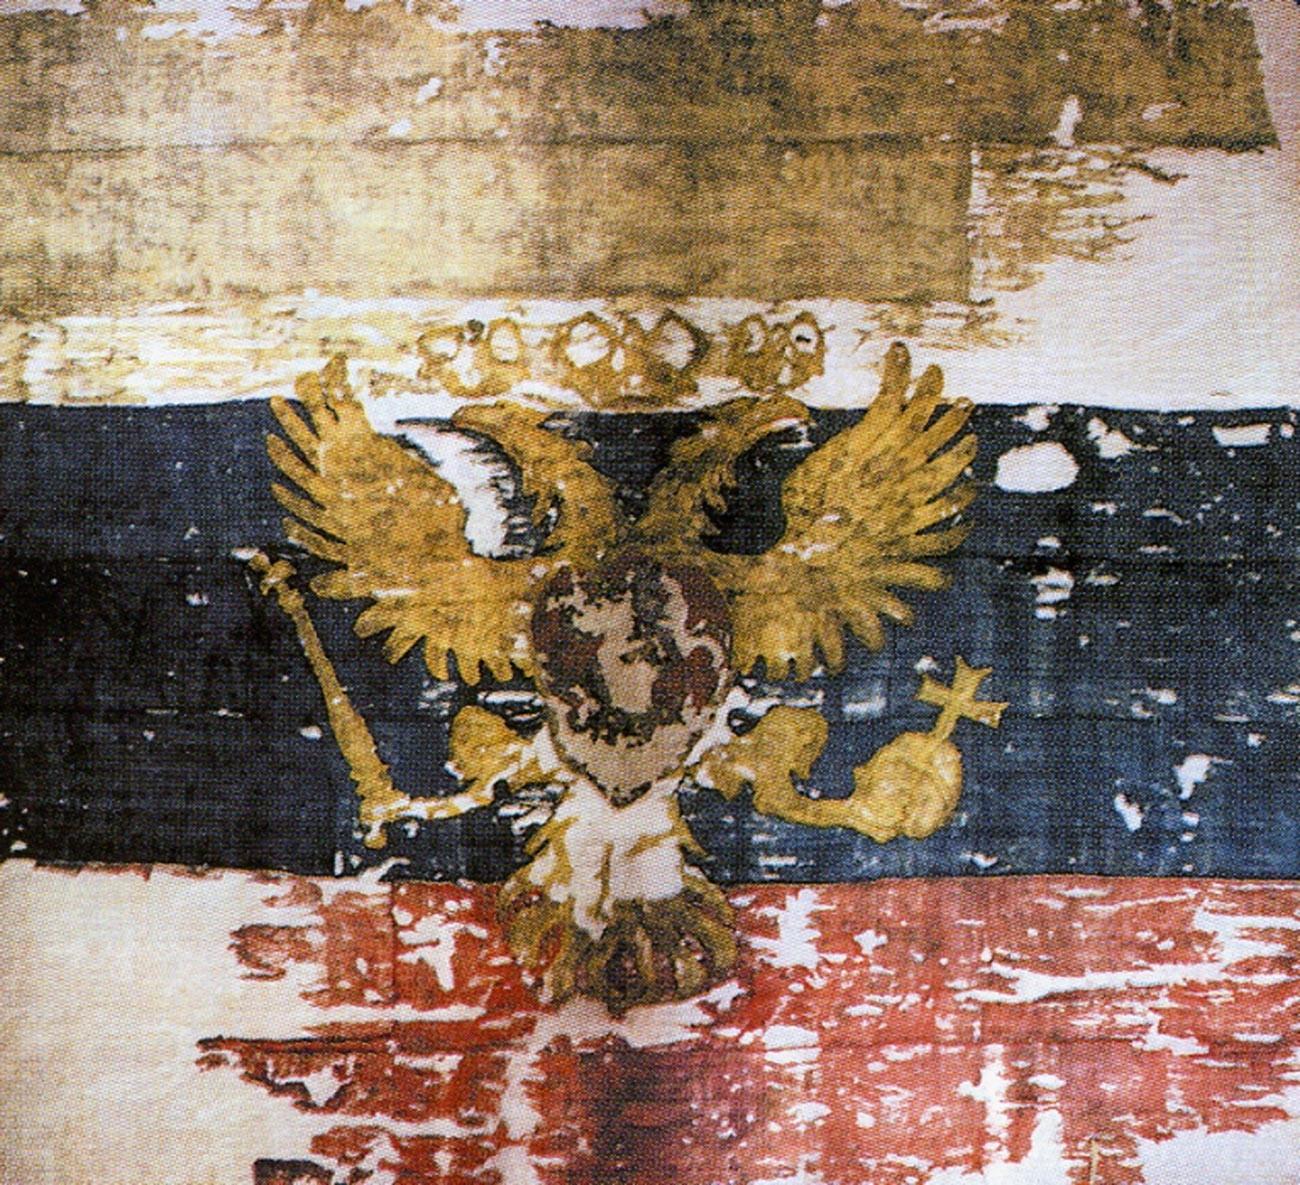 La bandera del zar de Moscú, 1693.